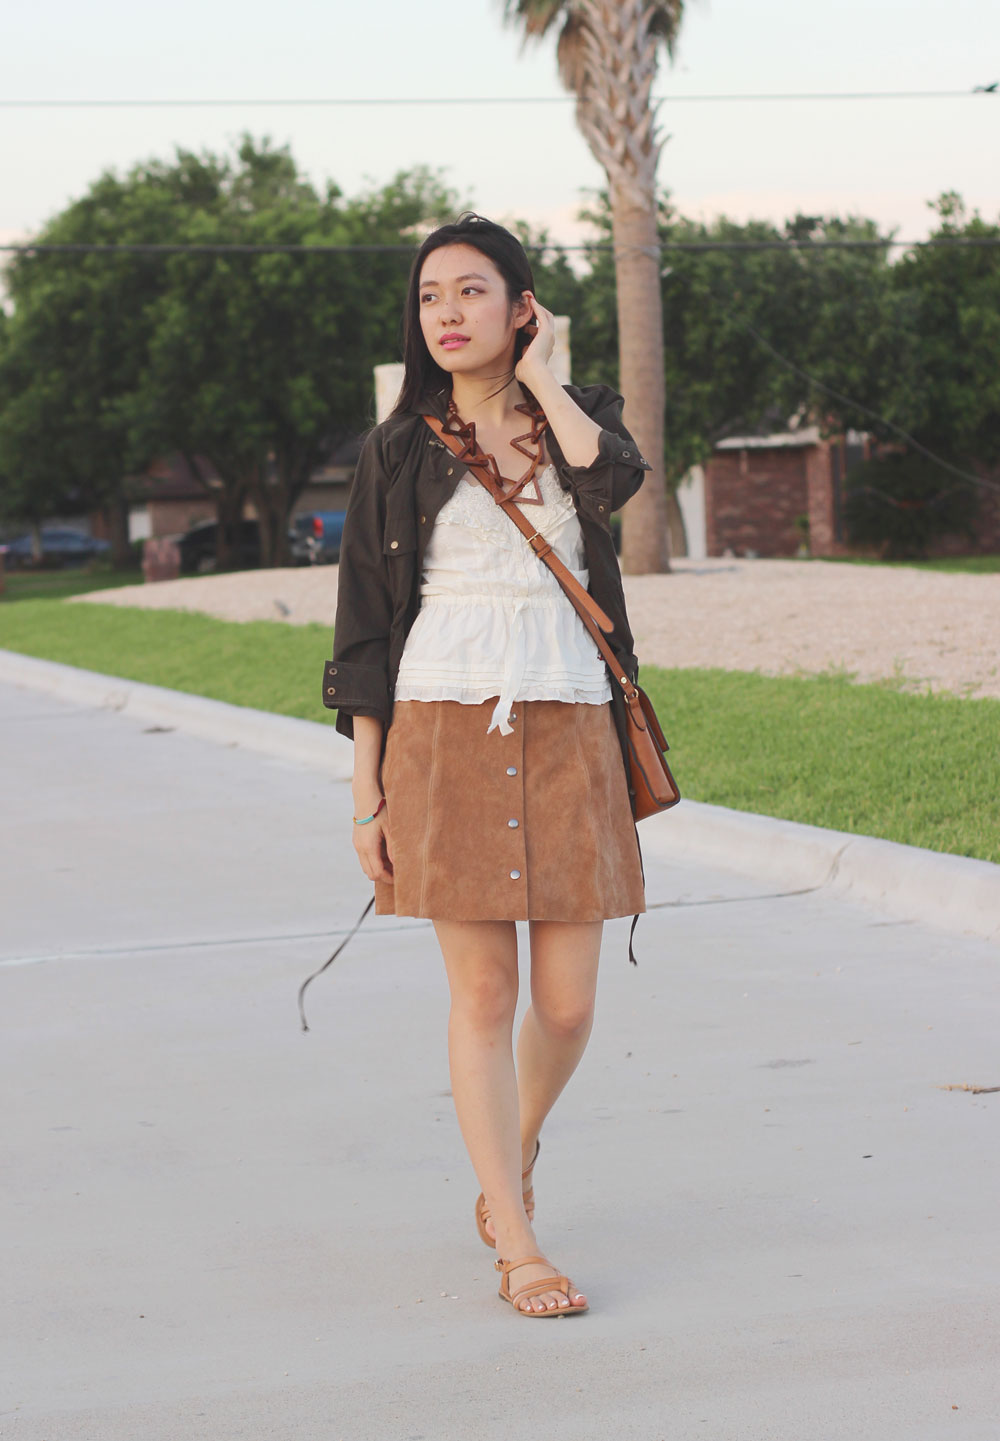 June 11, 2017 – Your skirt this season photo blog